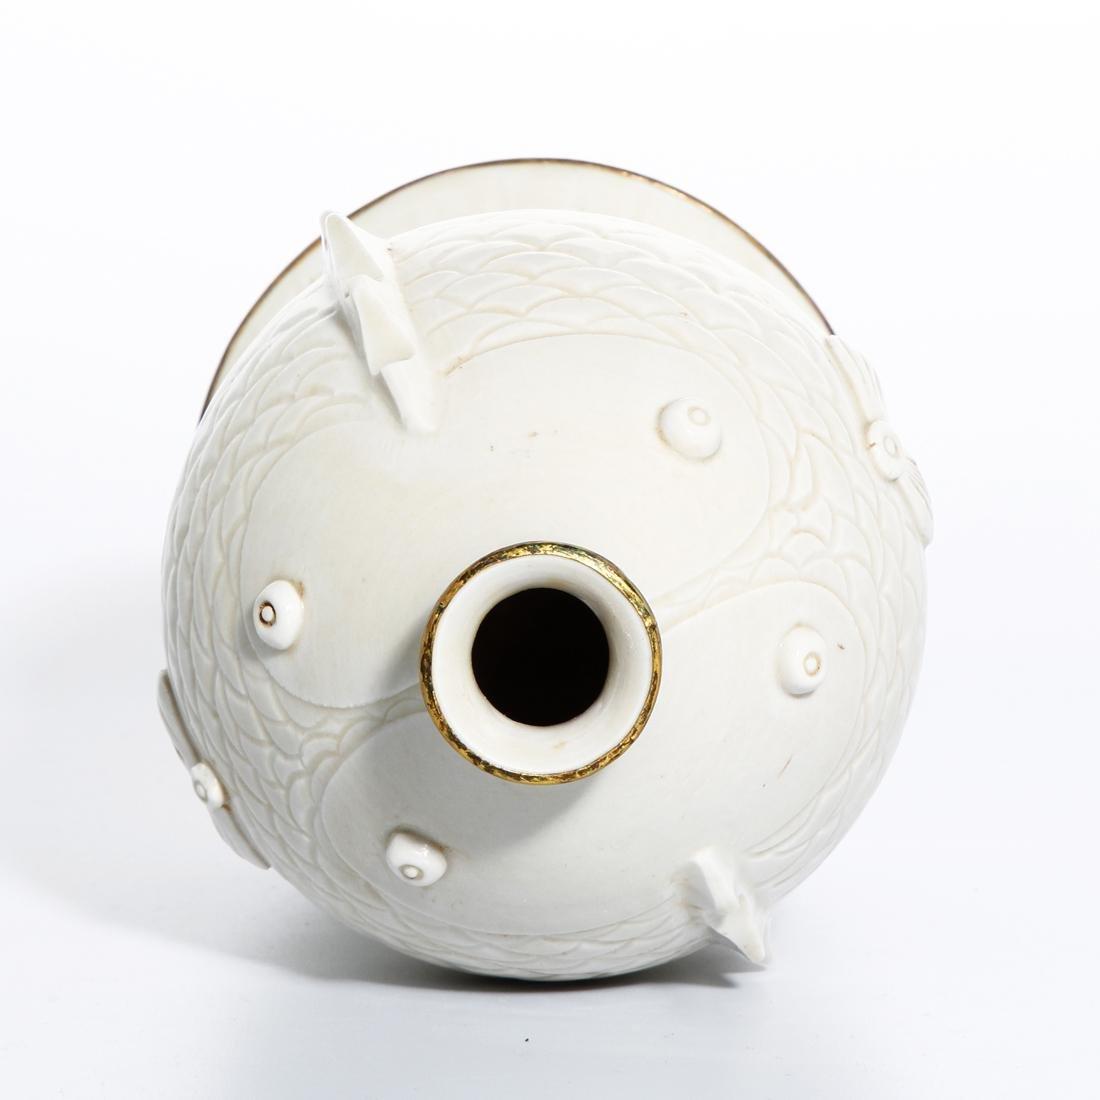 RareChinese Ding Ware Fish Form Bottle Vase - 6